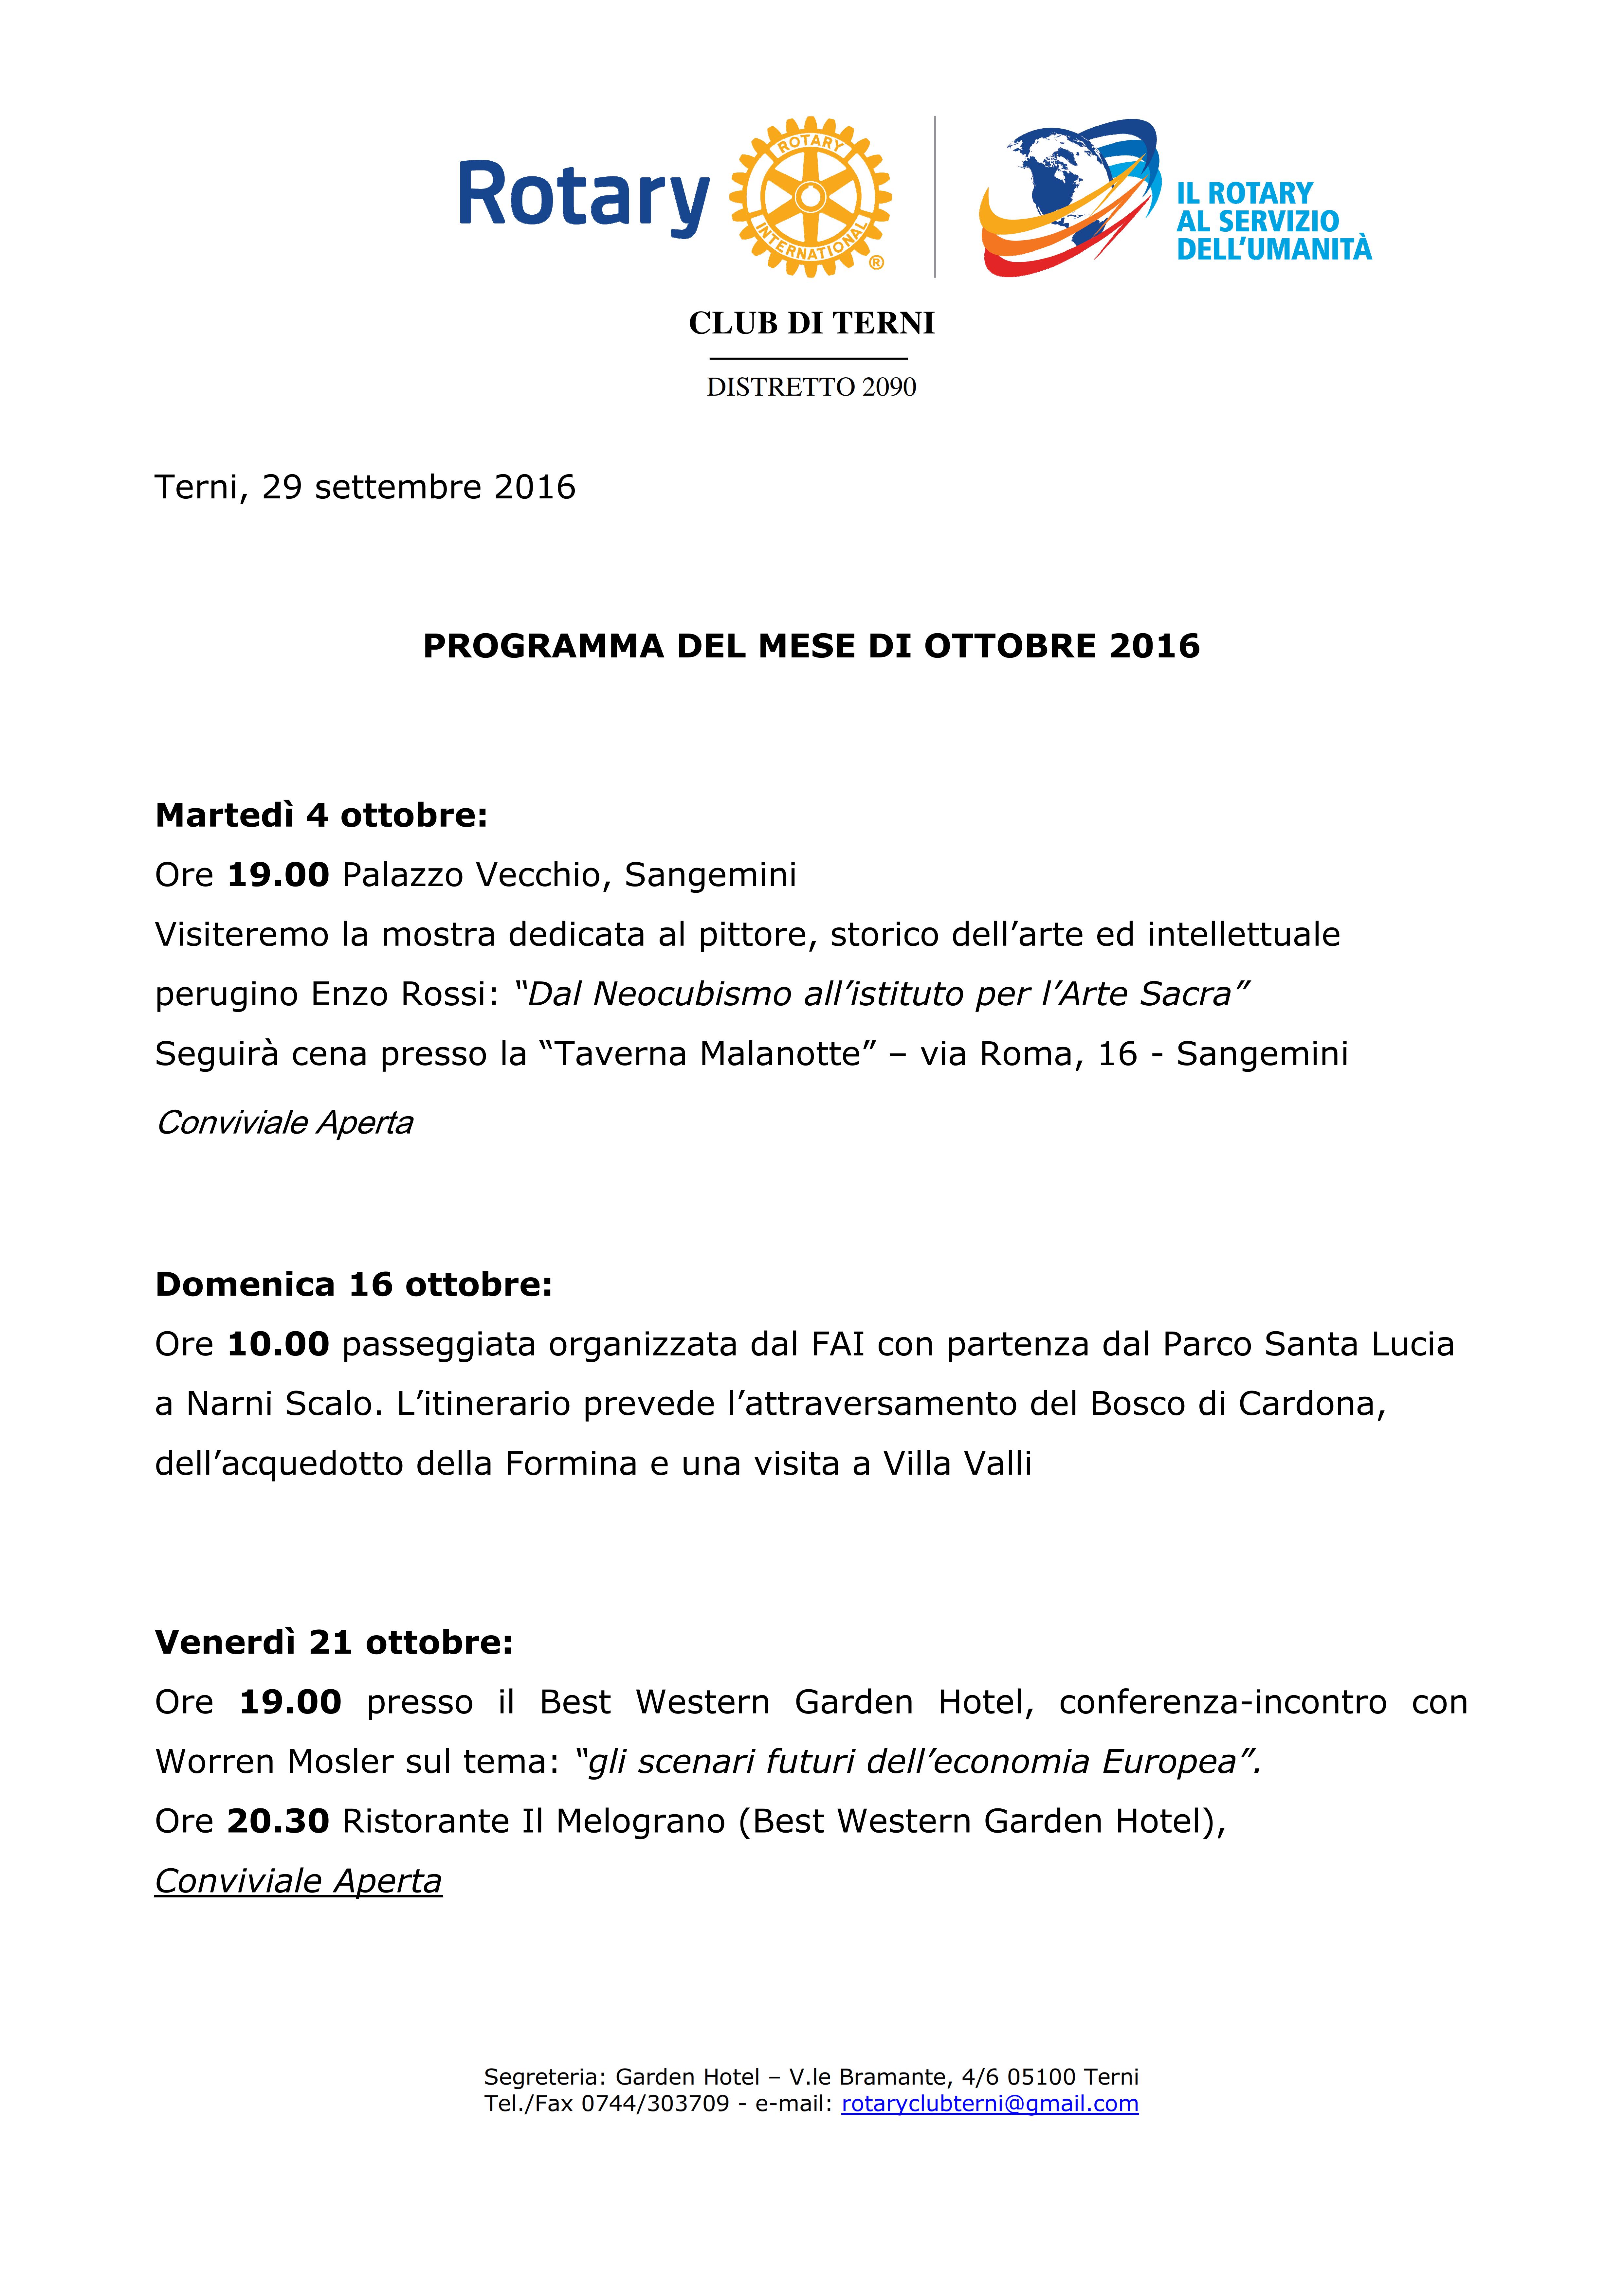 rotary-club-terni-programma-ottobre-2016_001